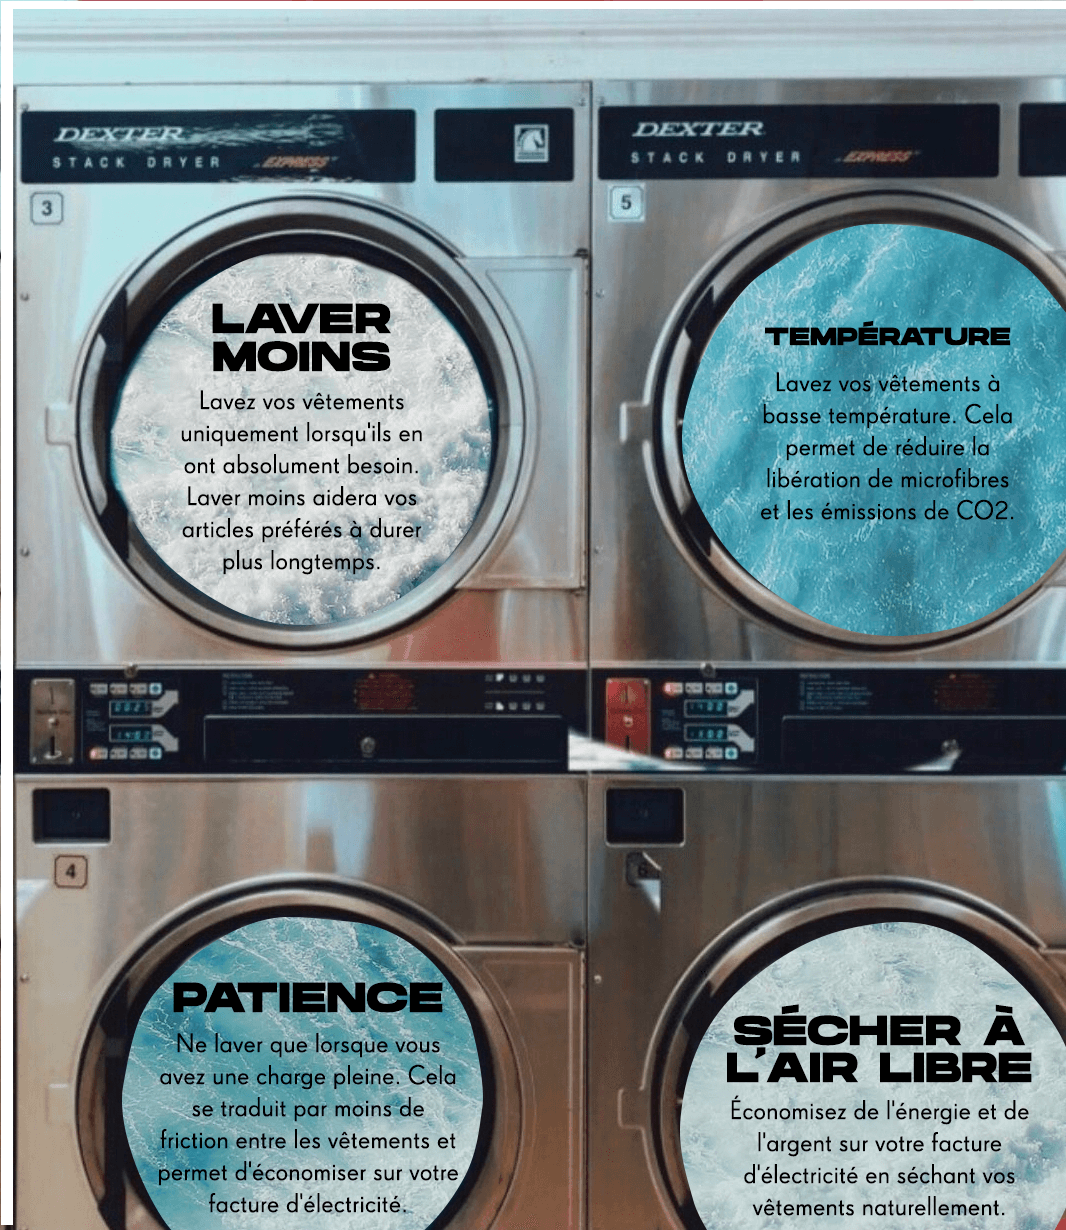 Washing Image